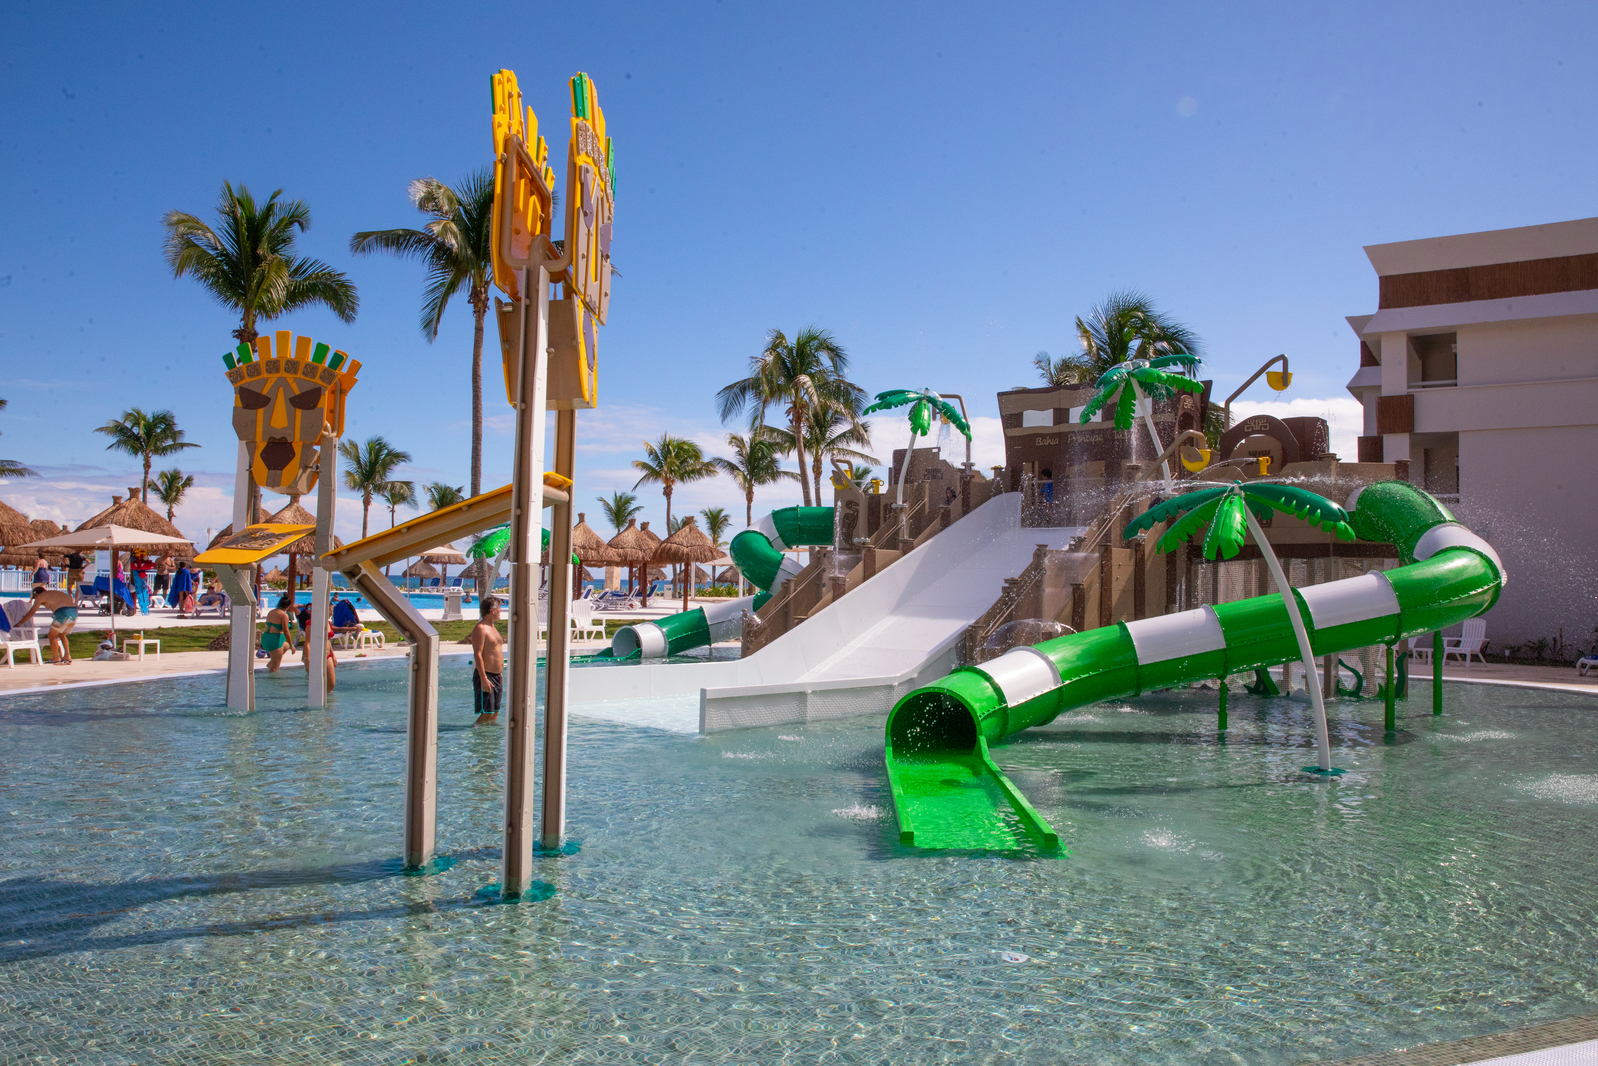 gbptul_mex_pool_waterpark_005_low